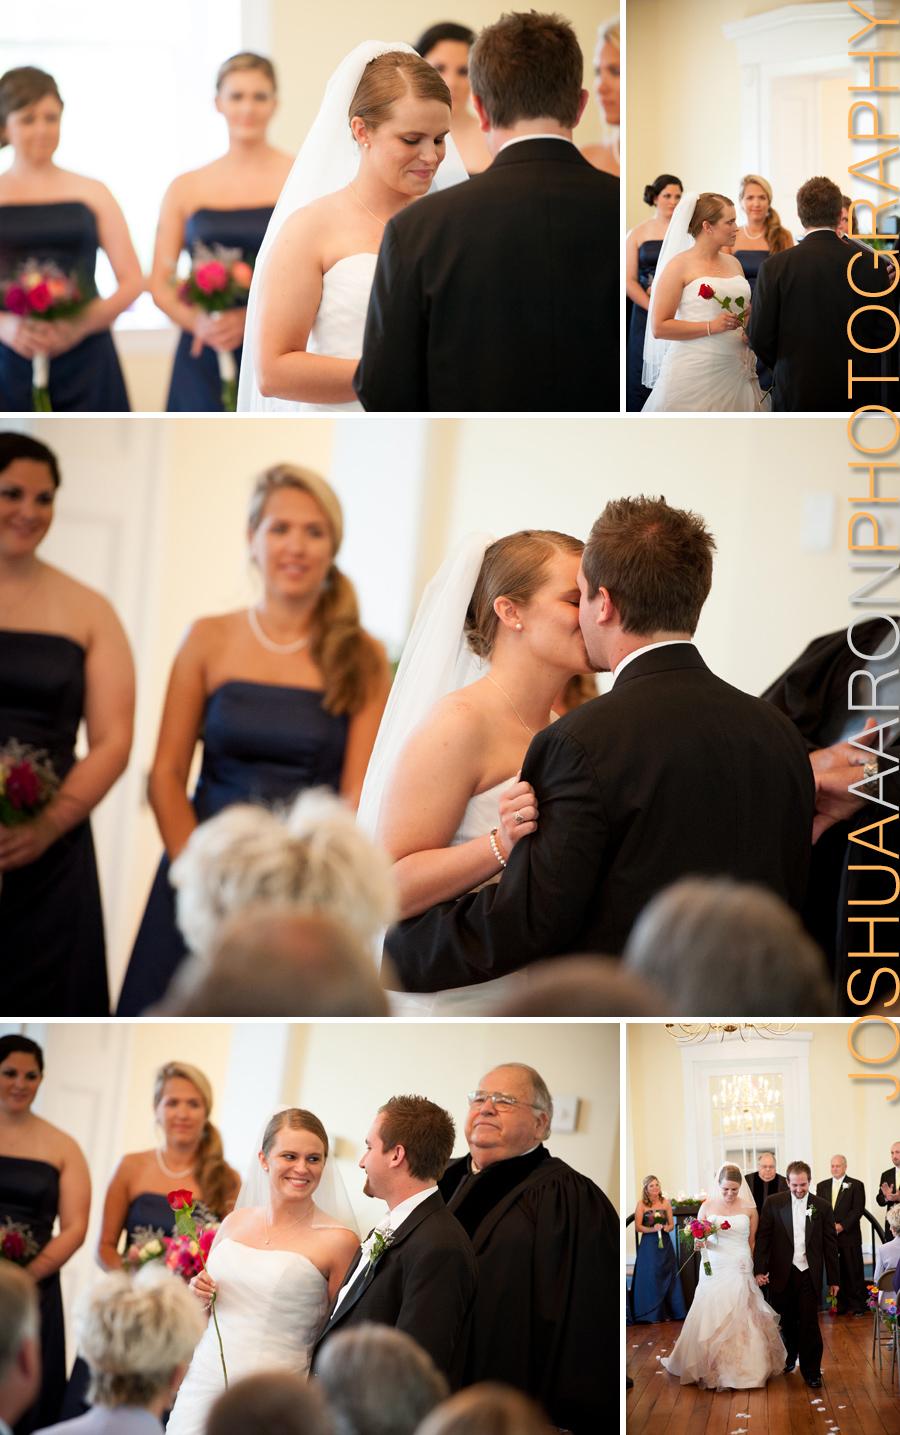 Robert Mills Courthouse wedding